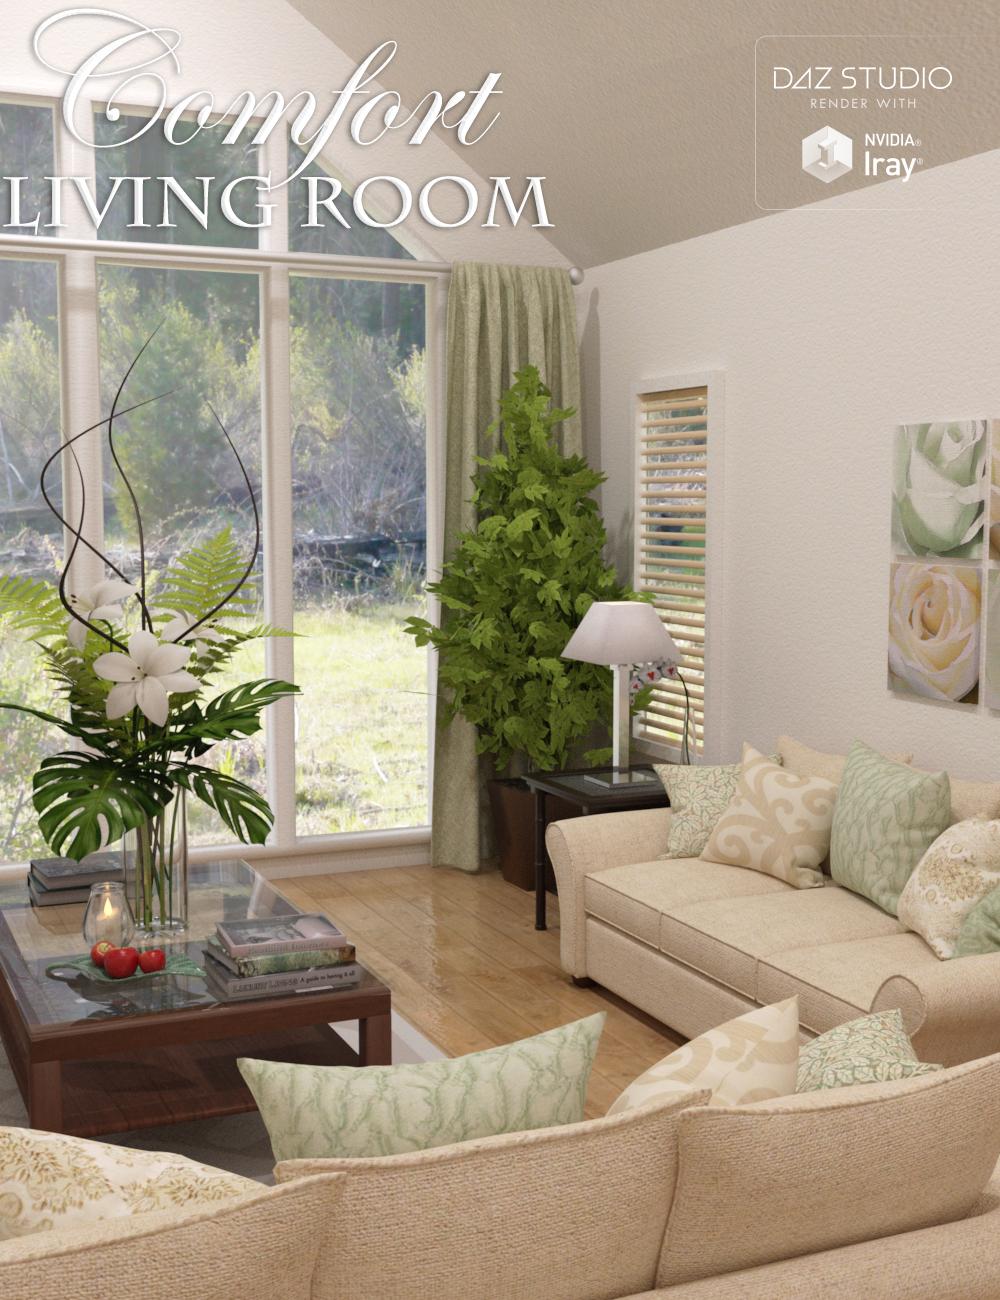 Comfort Living Room by: Nikisatez, 3D Models by Daz 3D